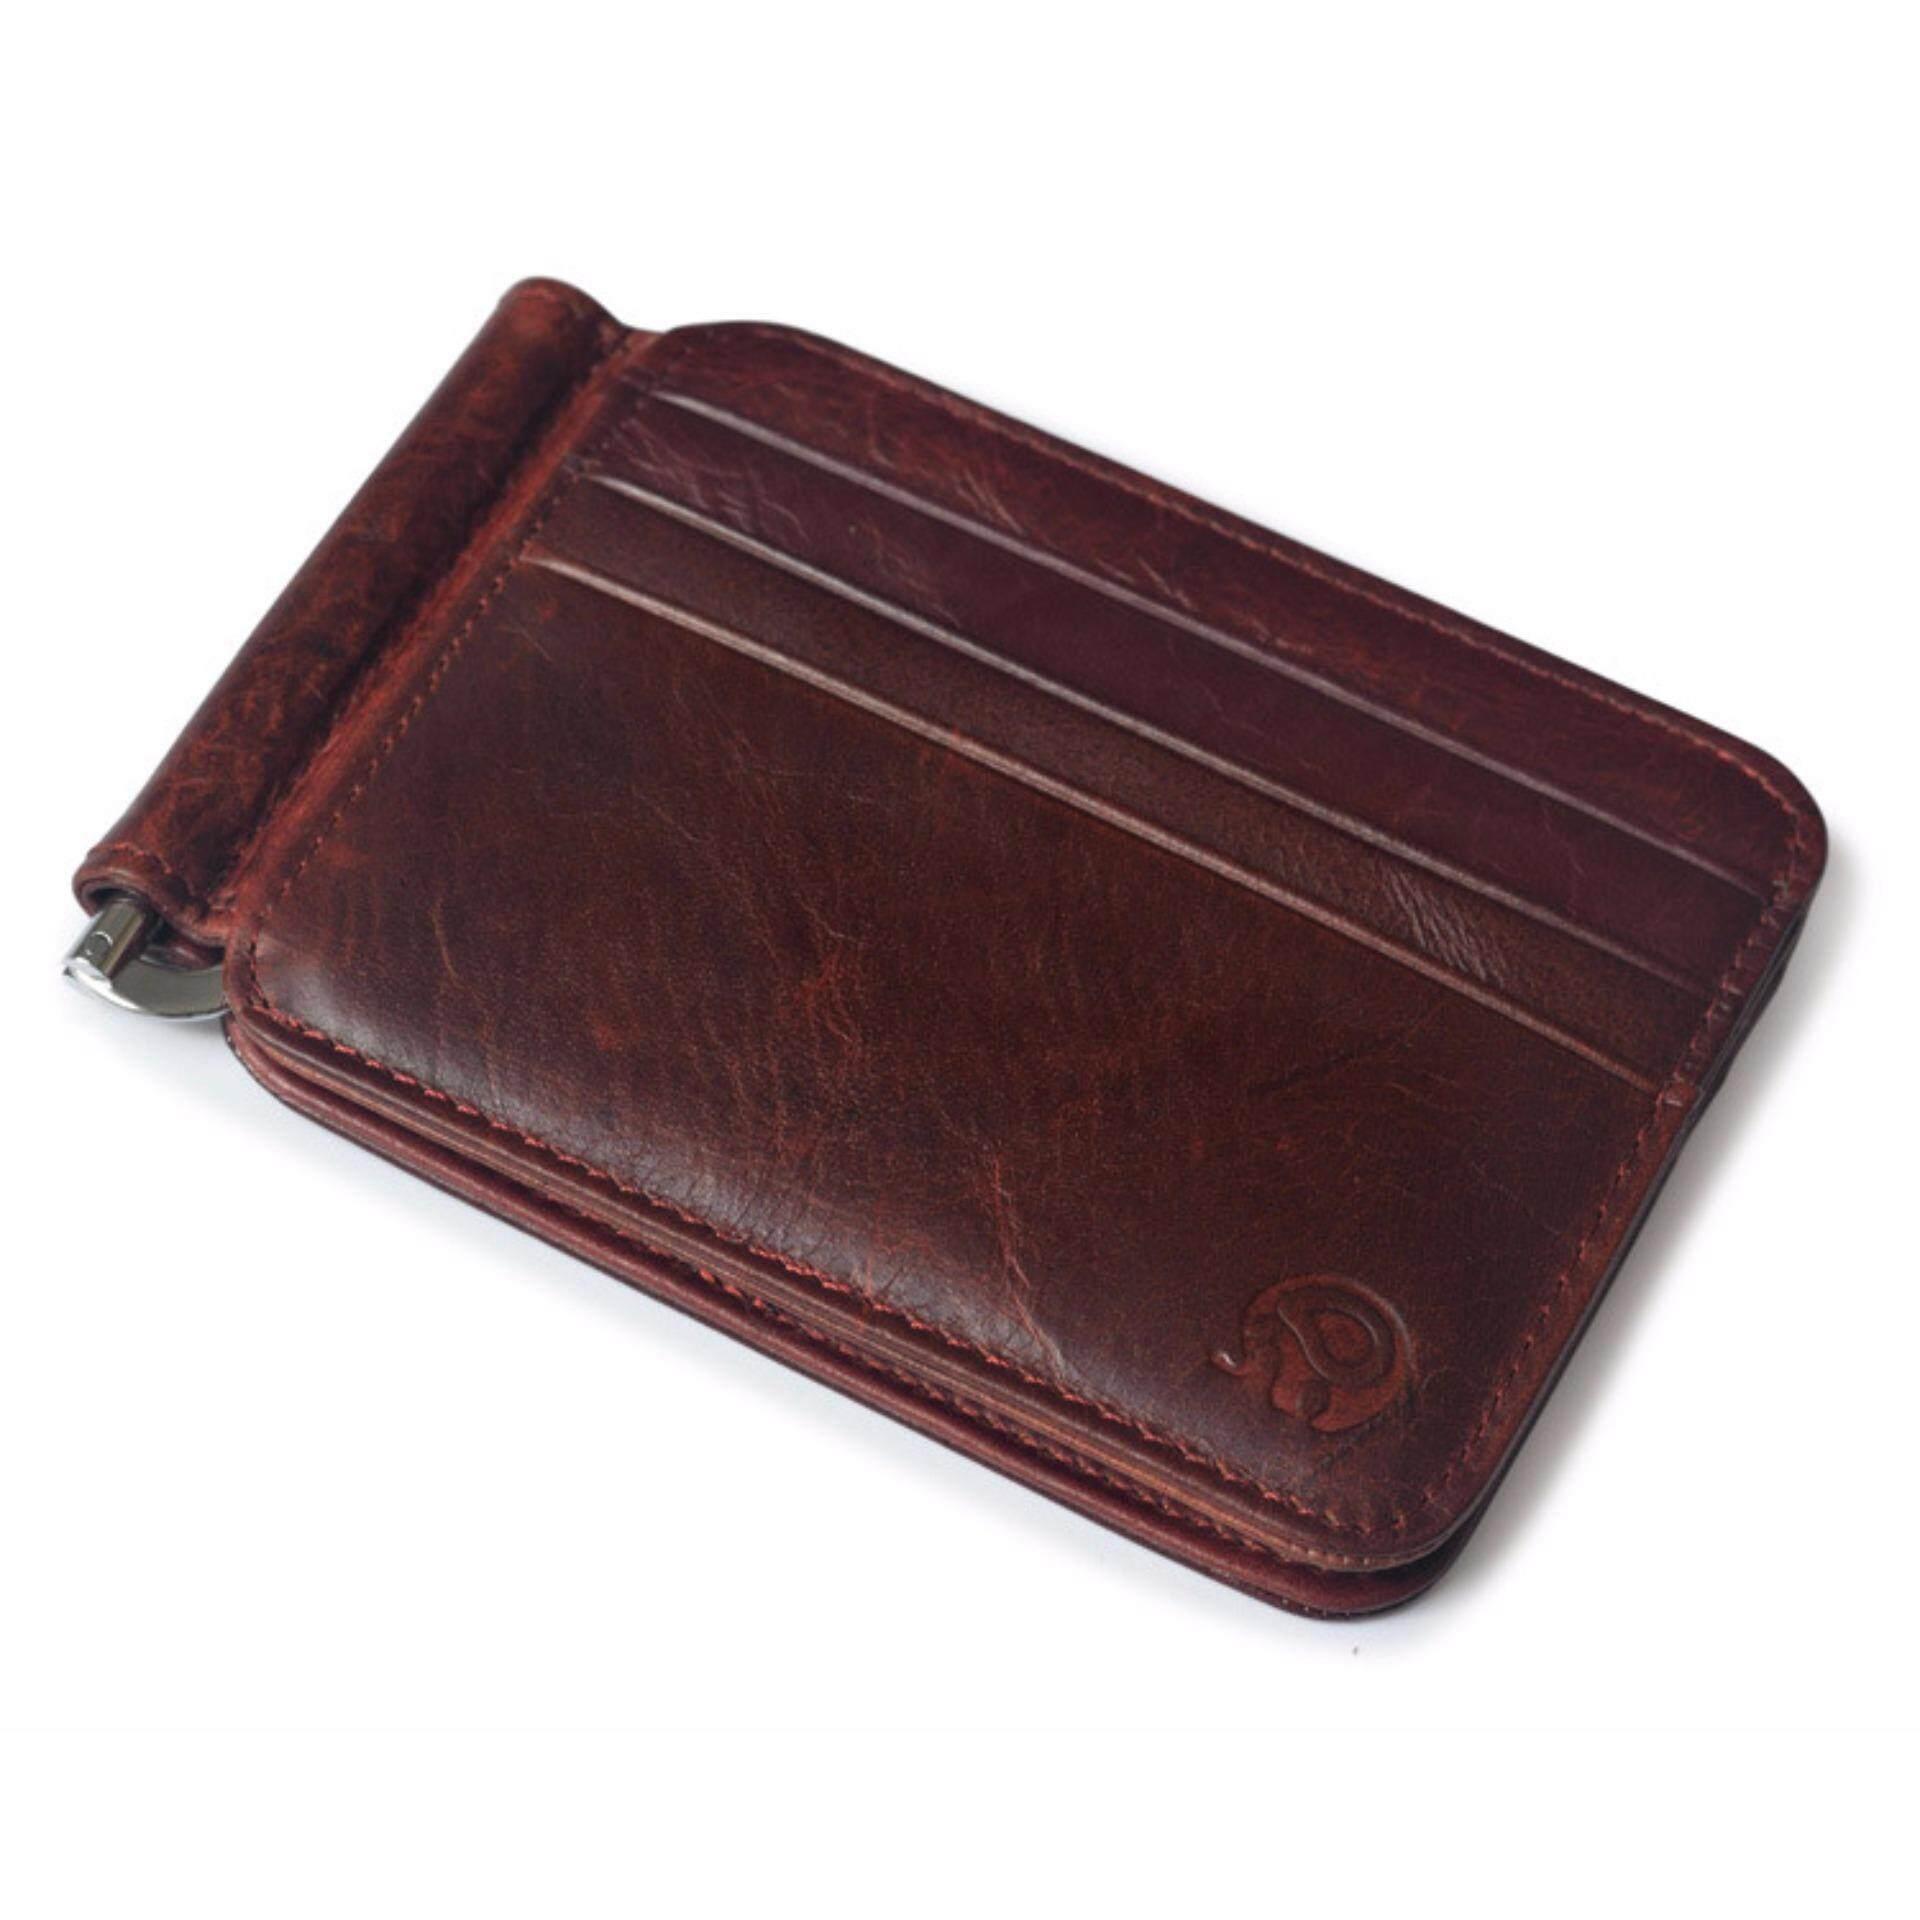 Vintage Money Clip Front Pocket Wallet Slim Minimalist Wallet RFID Blocking Wine Red - intl